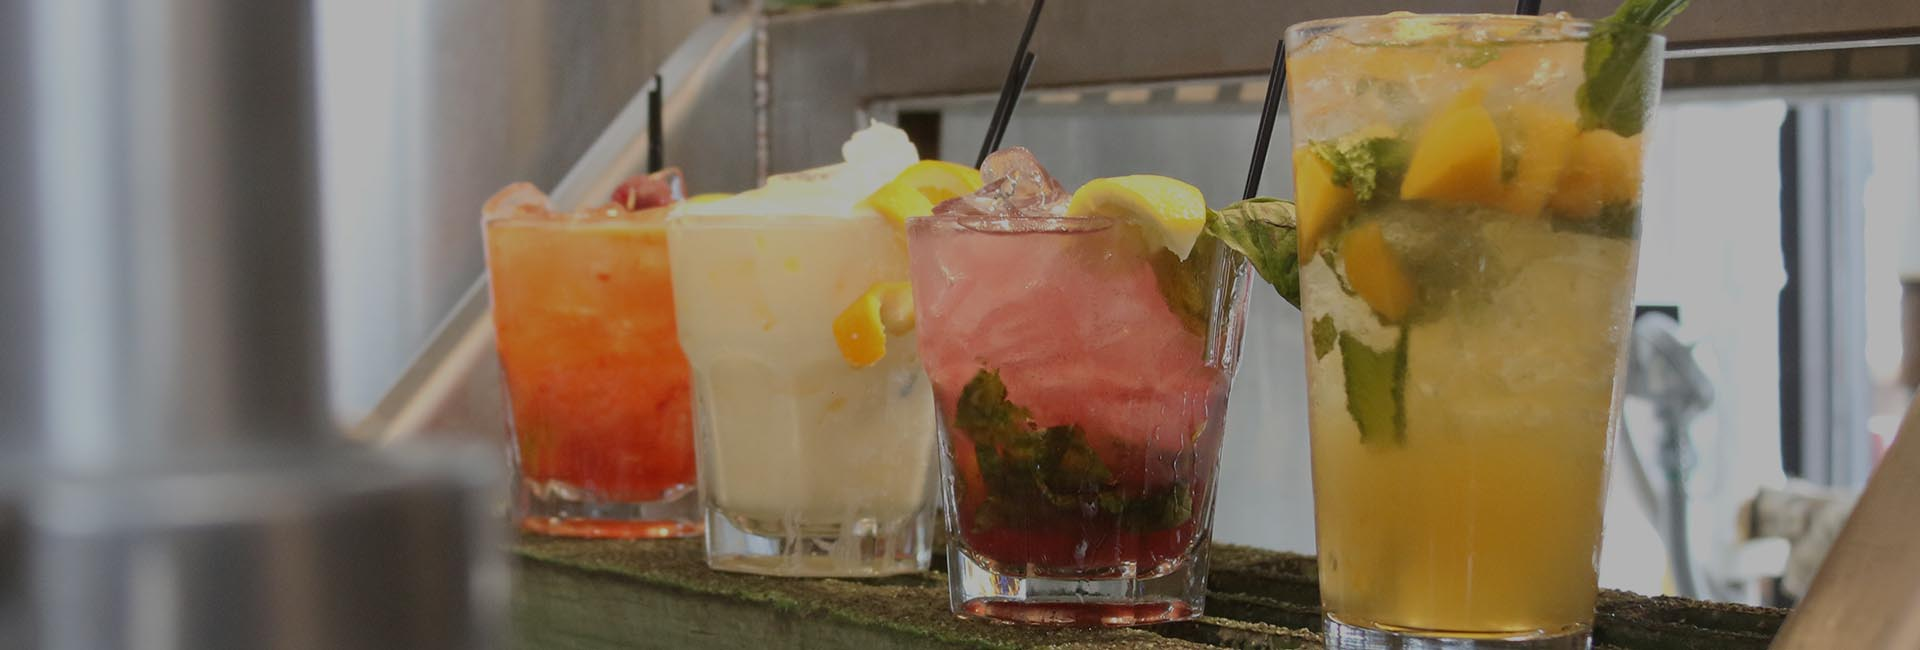 Big Bear Lake Brewing Company - Cocktails